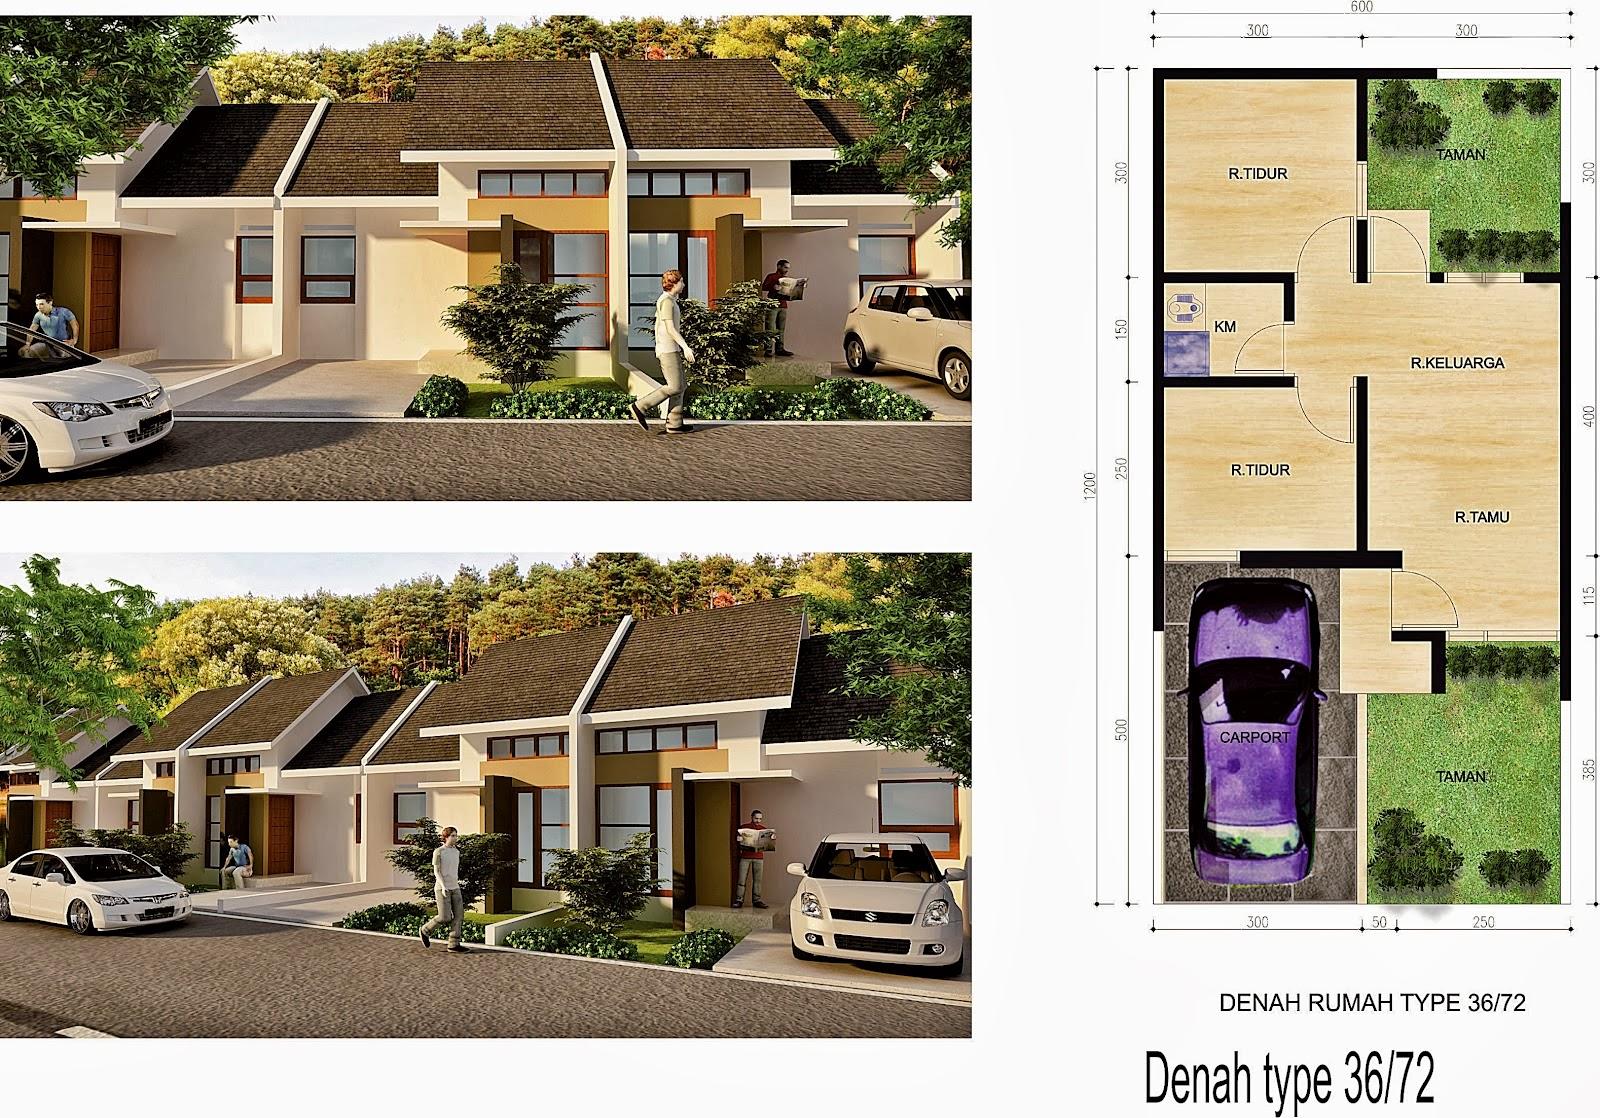 Rumah Minimalis Cat Abu Abu Terbaru Denah Rumah Type 36